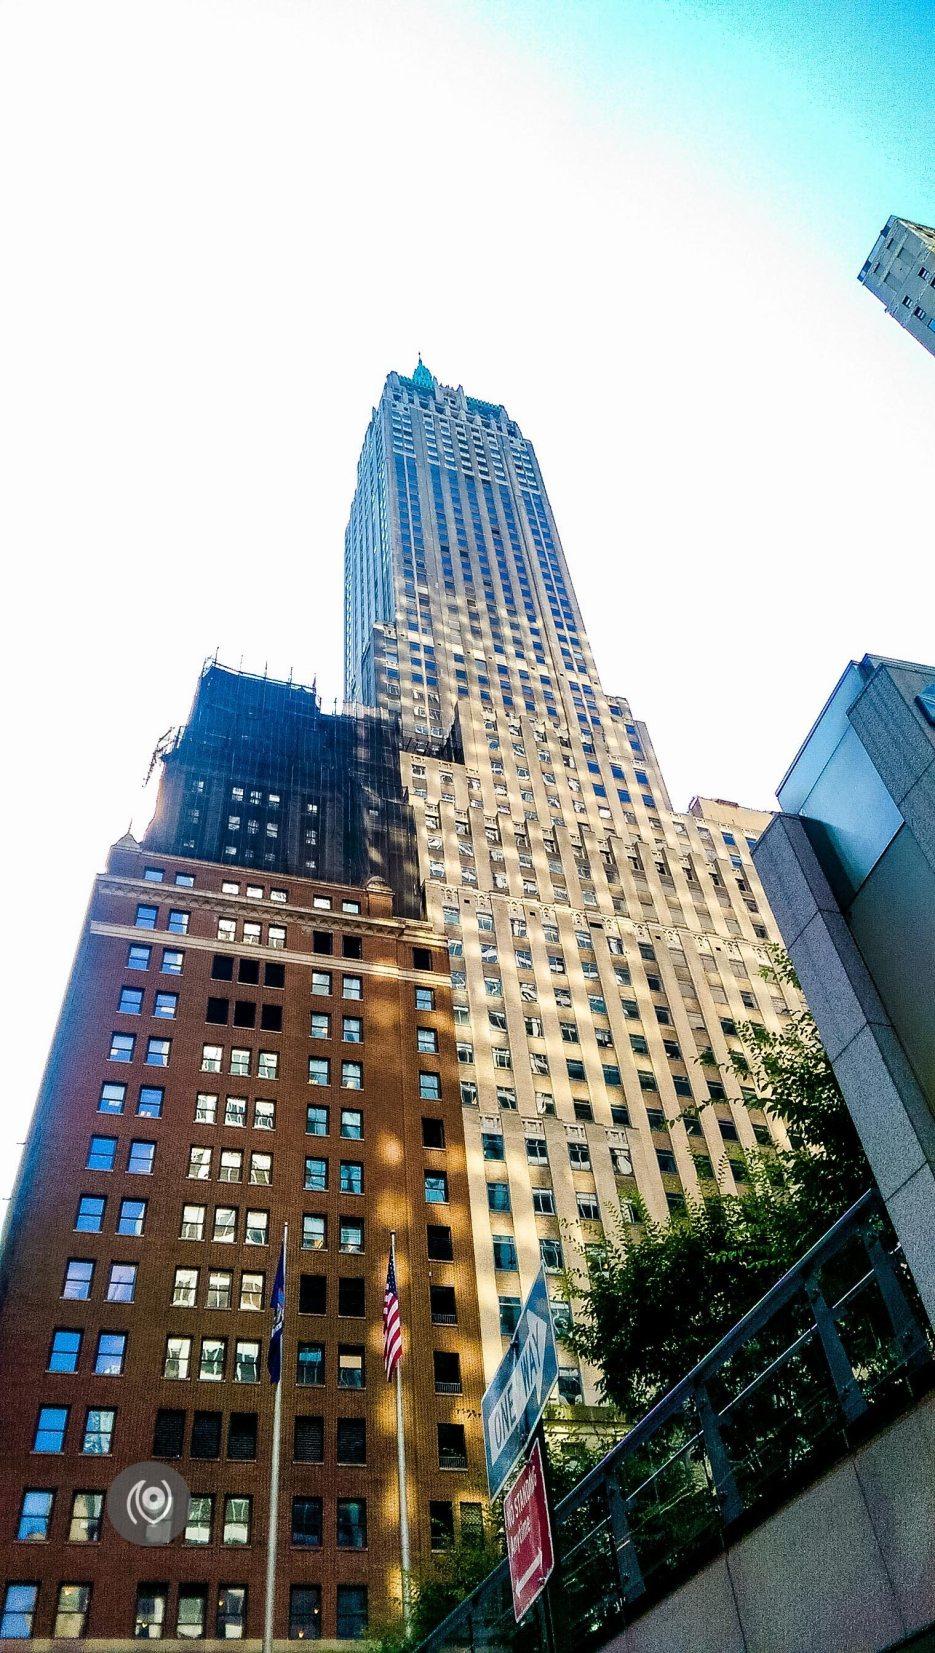 Financier Patisserie, Wall Street #REDHUxAIRBNB #EyesForNewYork #REDHUxNYC Naina.co Luxury & Lifestyle, Photographer Storyteller, Blogger